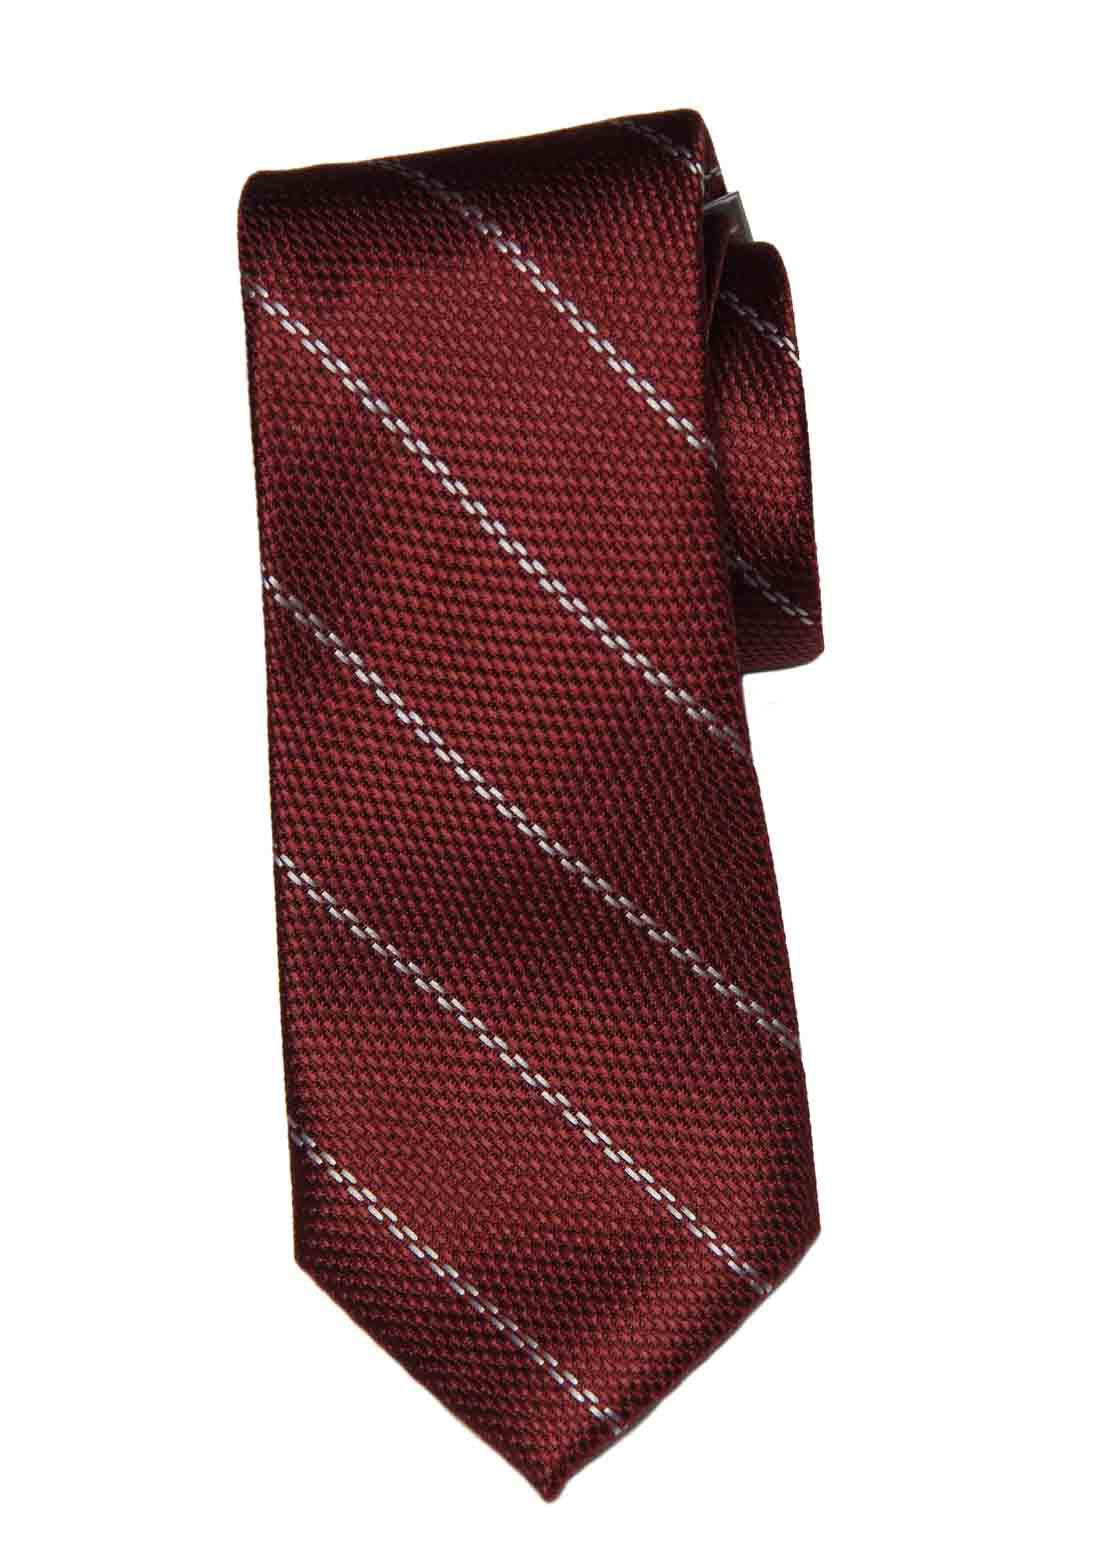 Michael Kors Tie Red White Striped Silk Men's